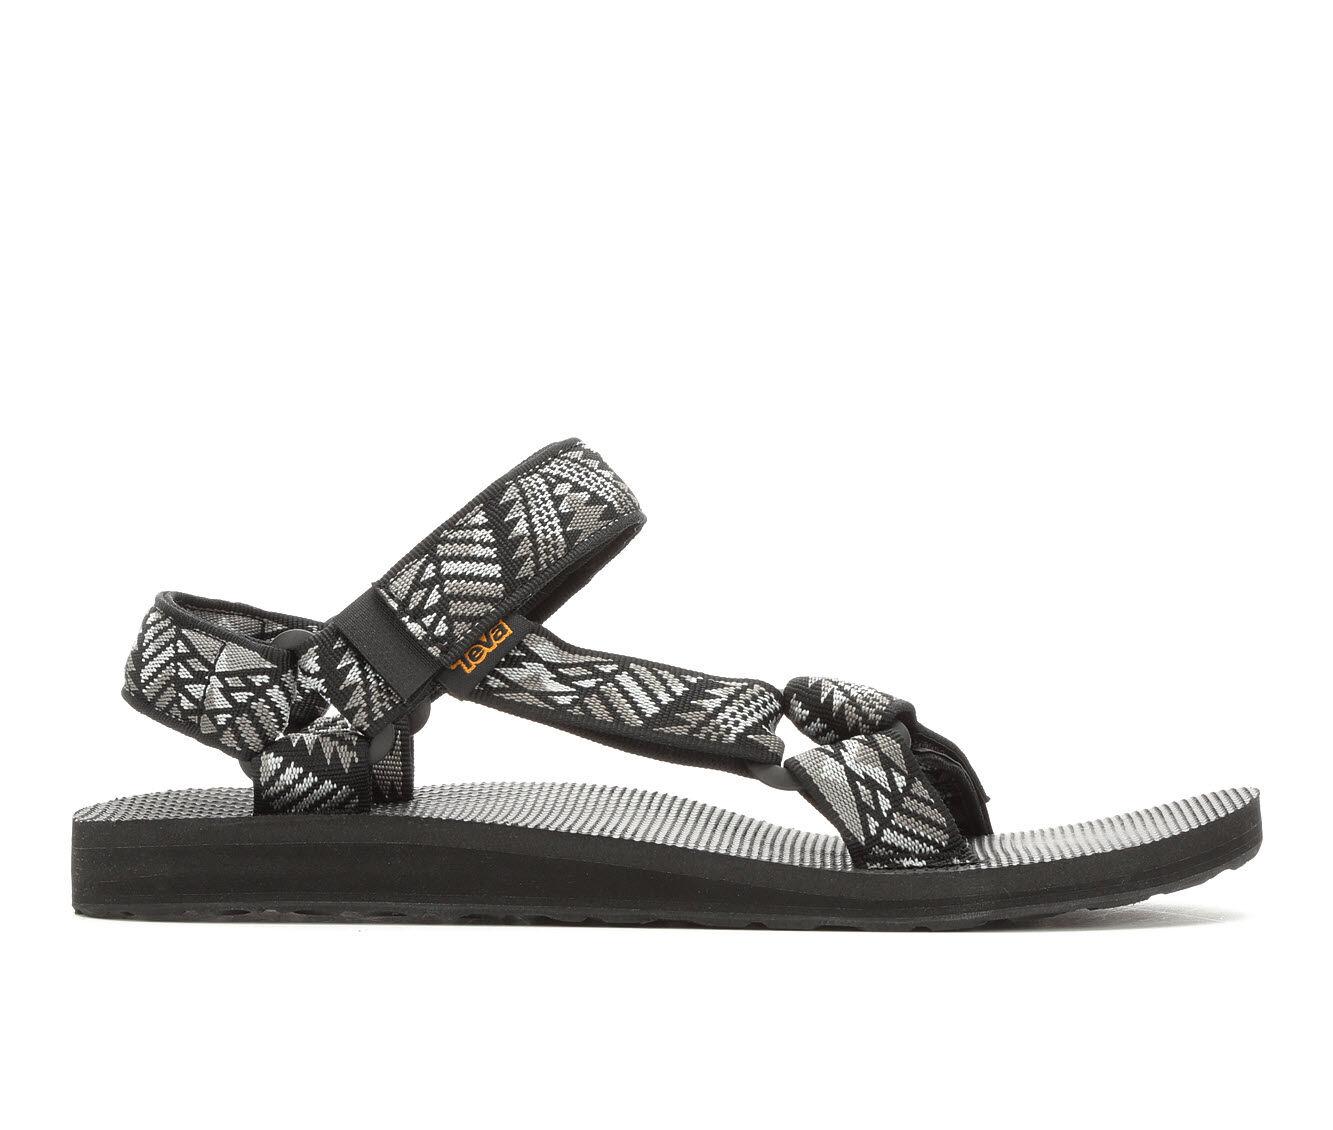 Men's Teva Original Universal Outdoor Sandals Bmrang Bk/Wht